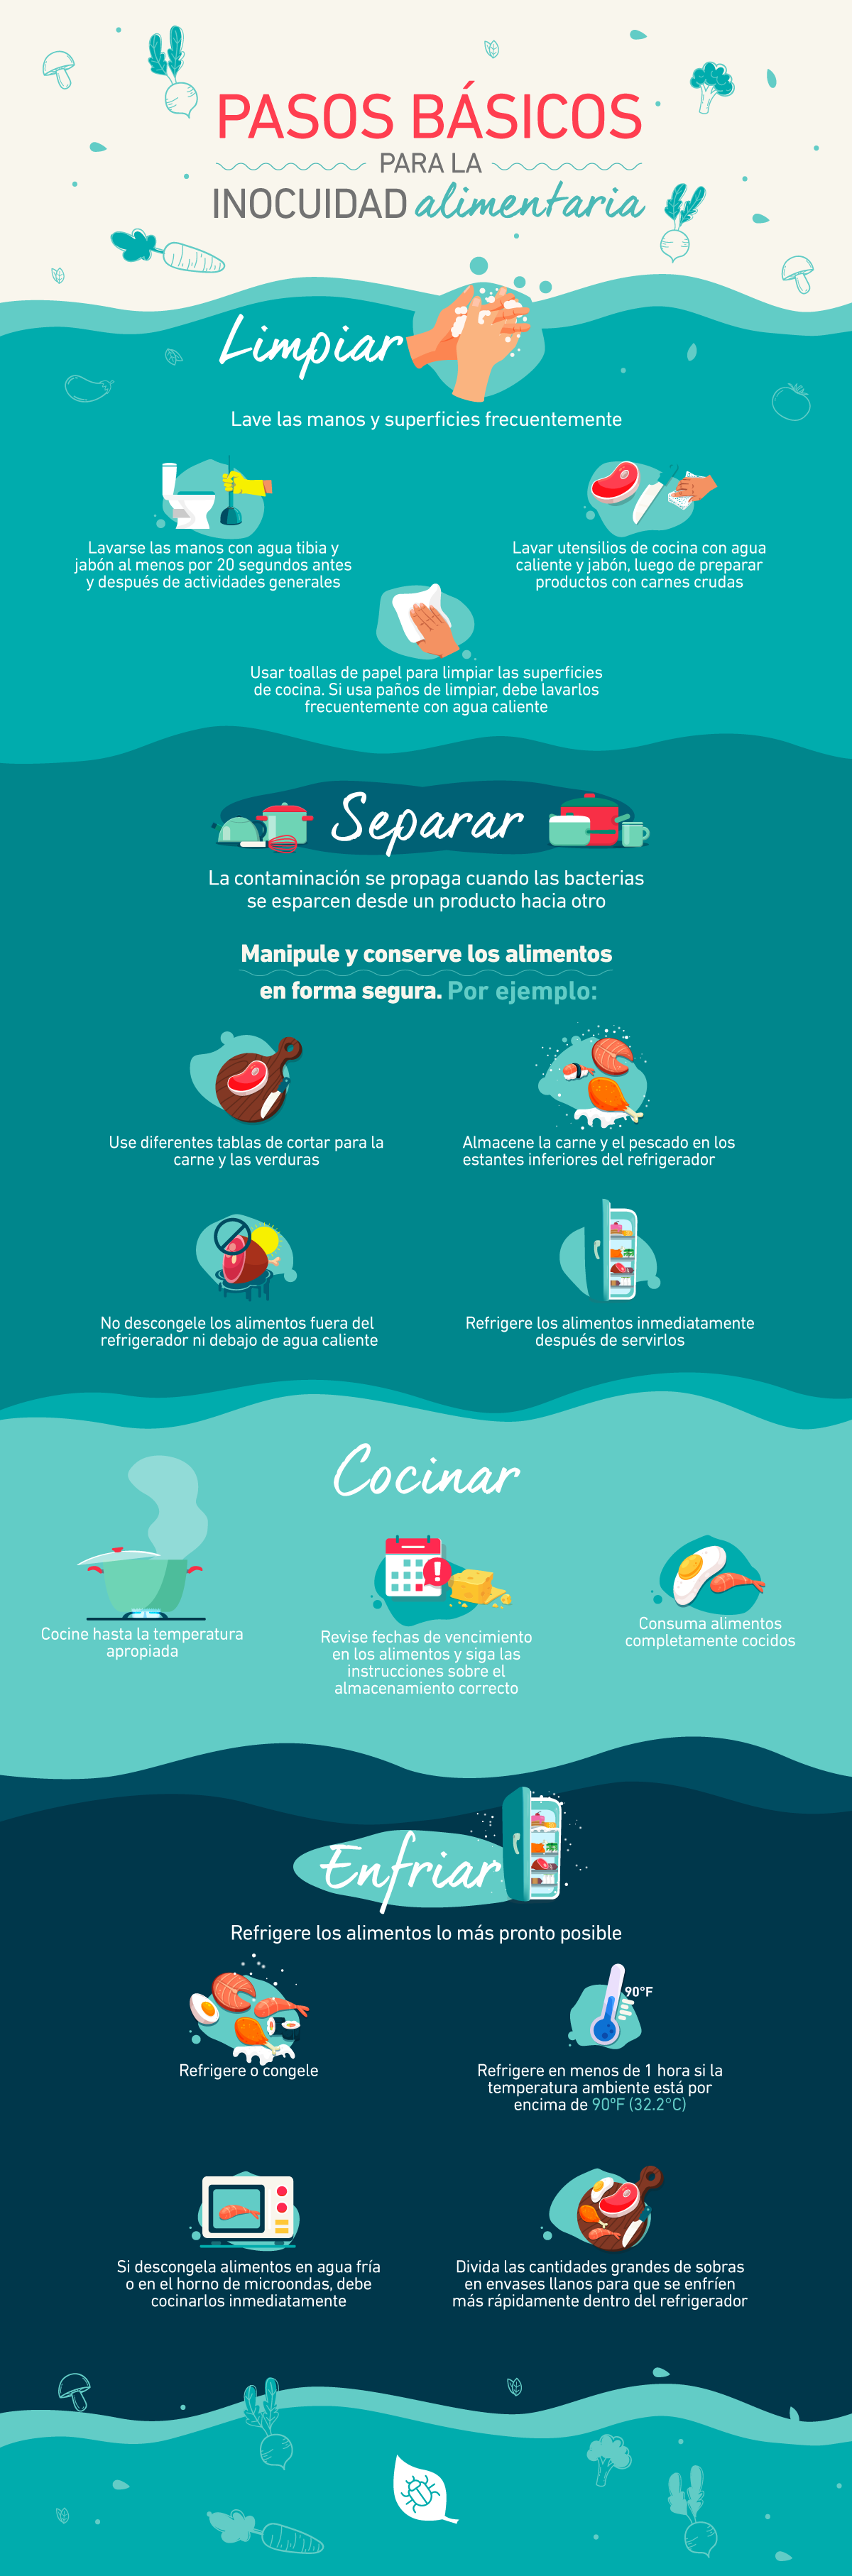 infografia pasos basico para la inocuidad alimentaria